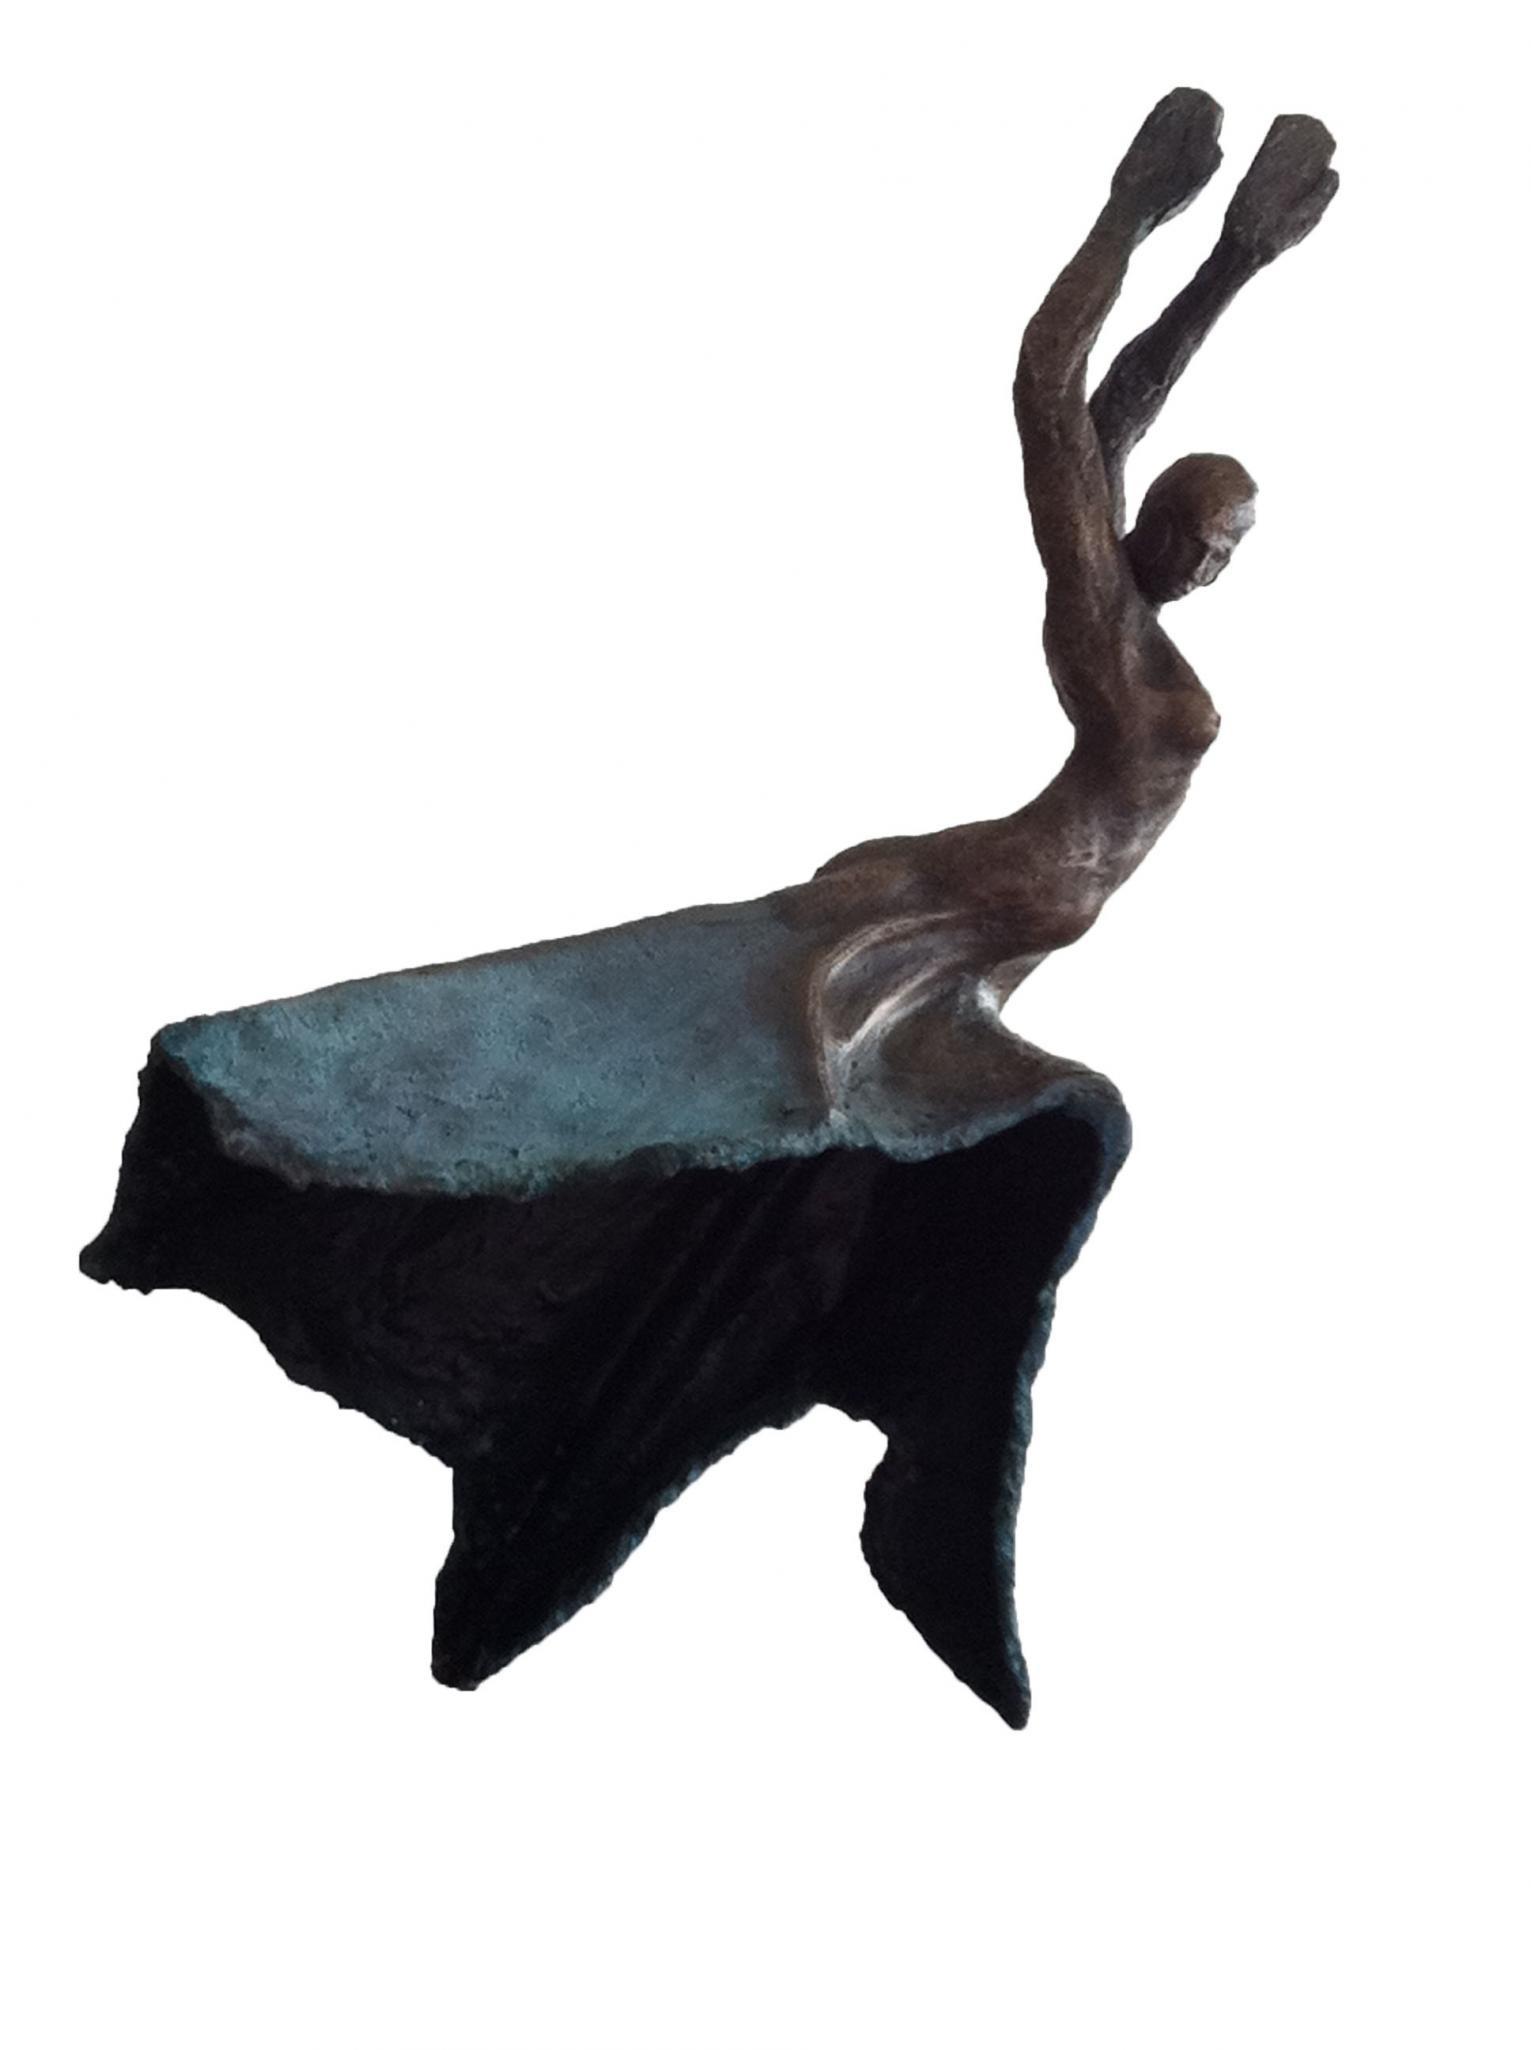 Emmanuel Okoro, INSPIRATION, 2011, £1500, bronze, original, Degree Art